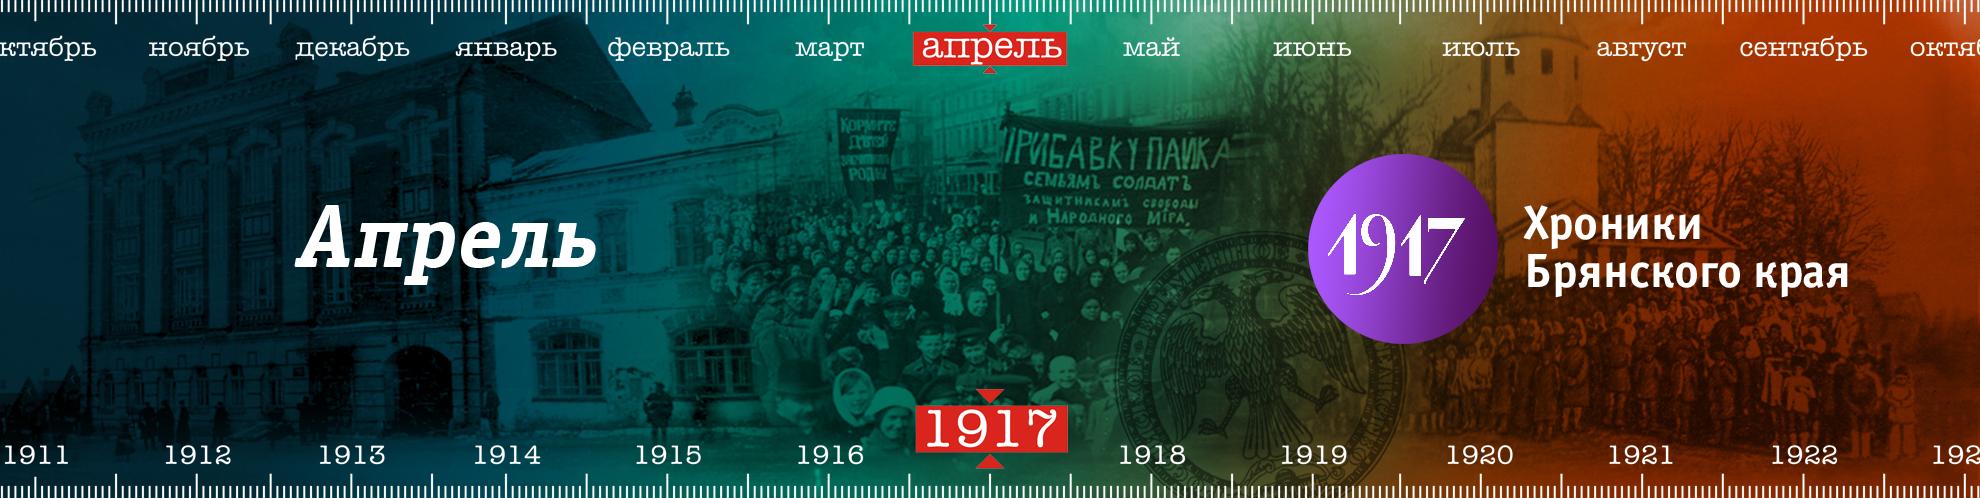 1917. Хроники Брянского края - Апрель